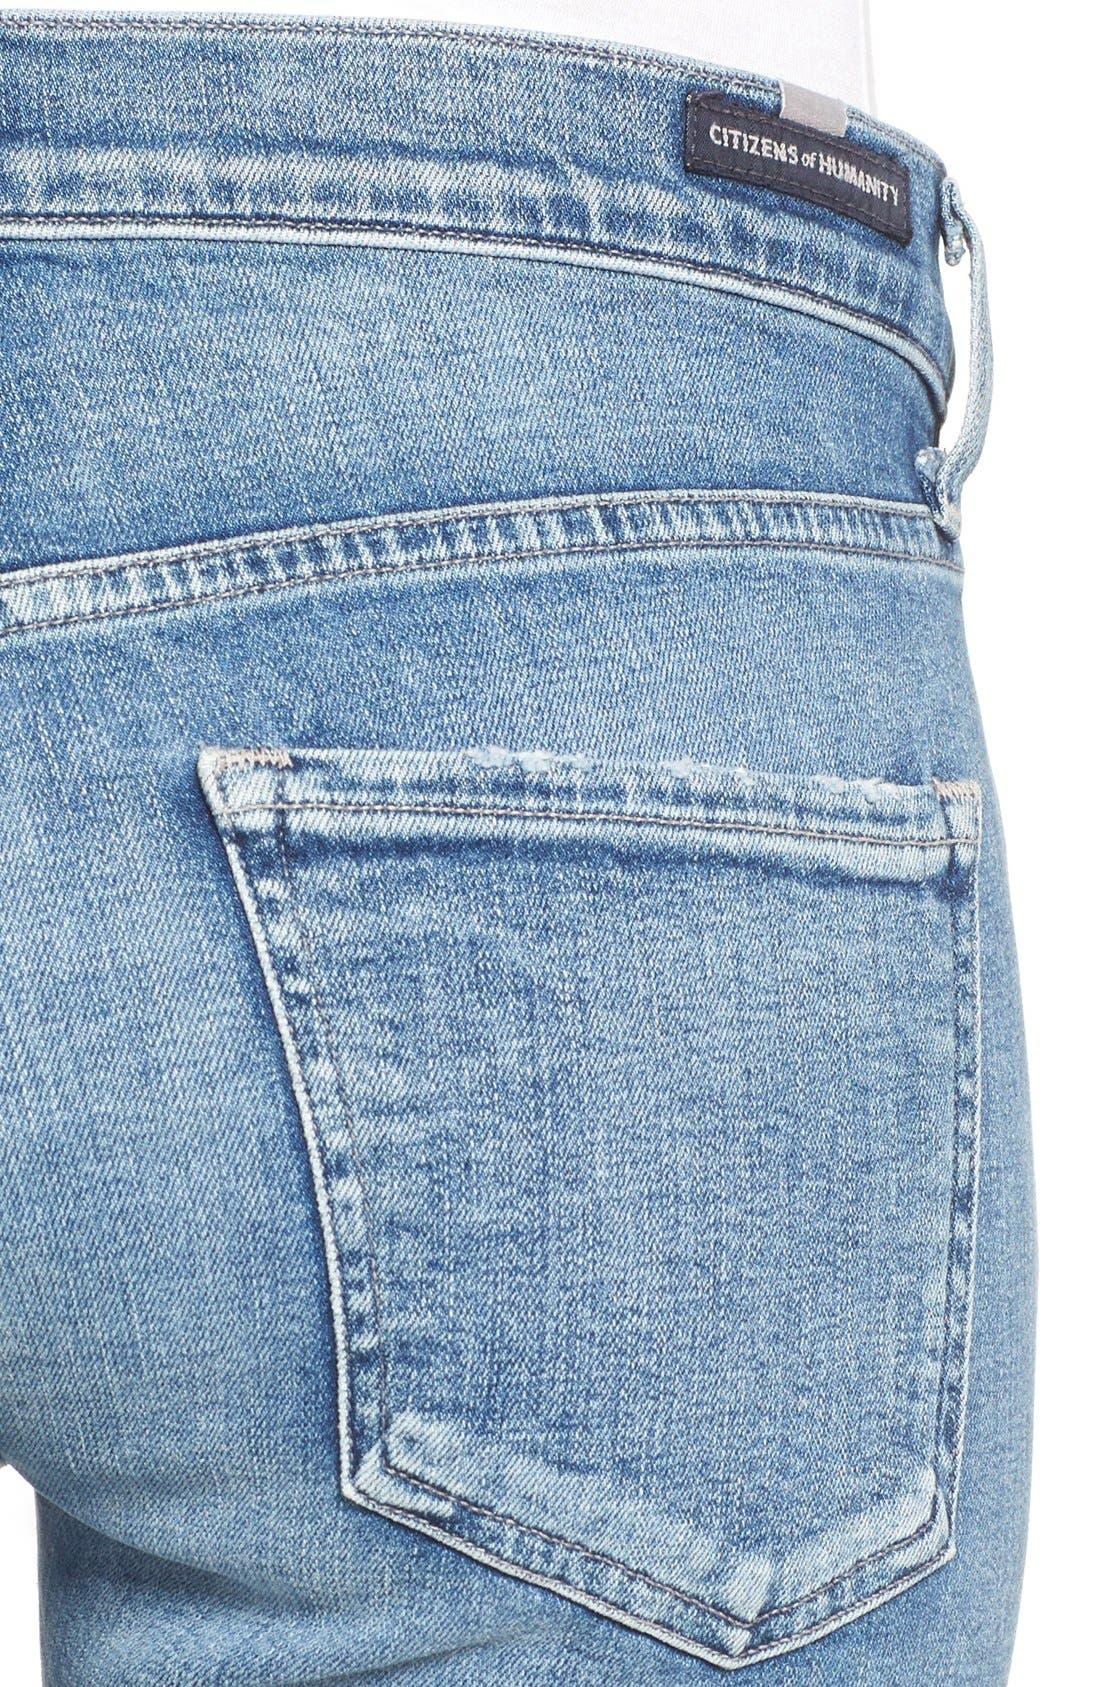 Jazmin Crop Straight Leg Jeans,                             Alternate thumbnail 5, color,                             424